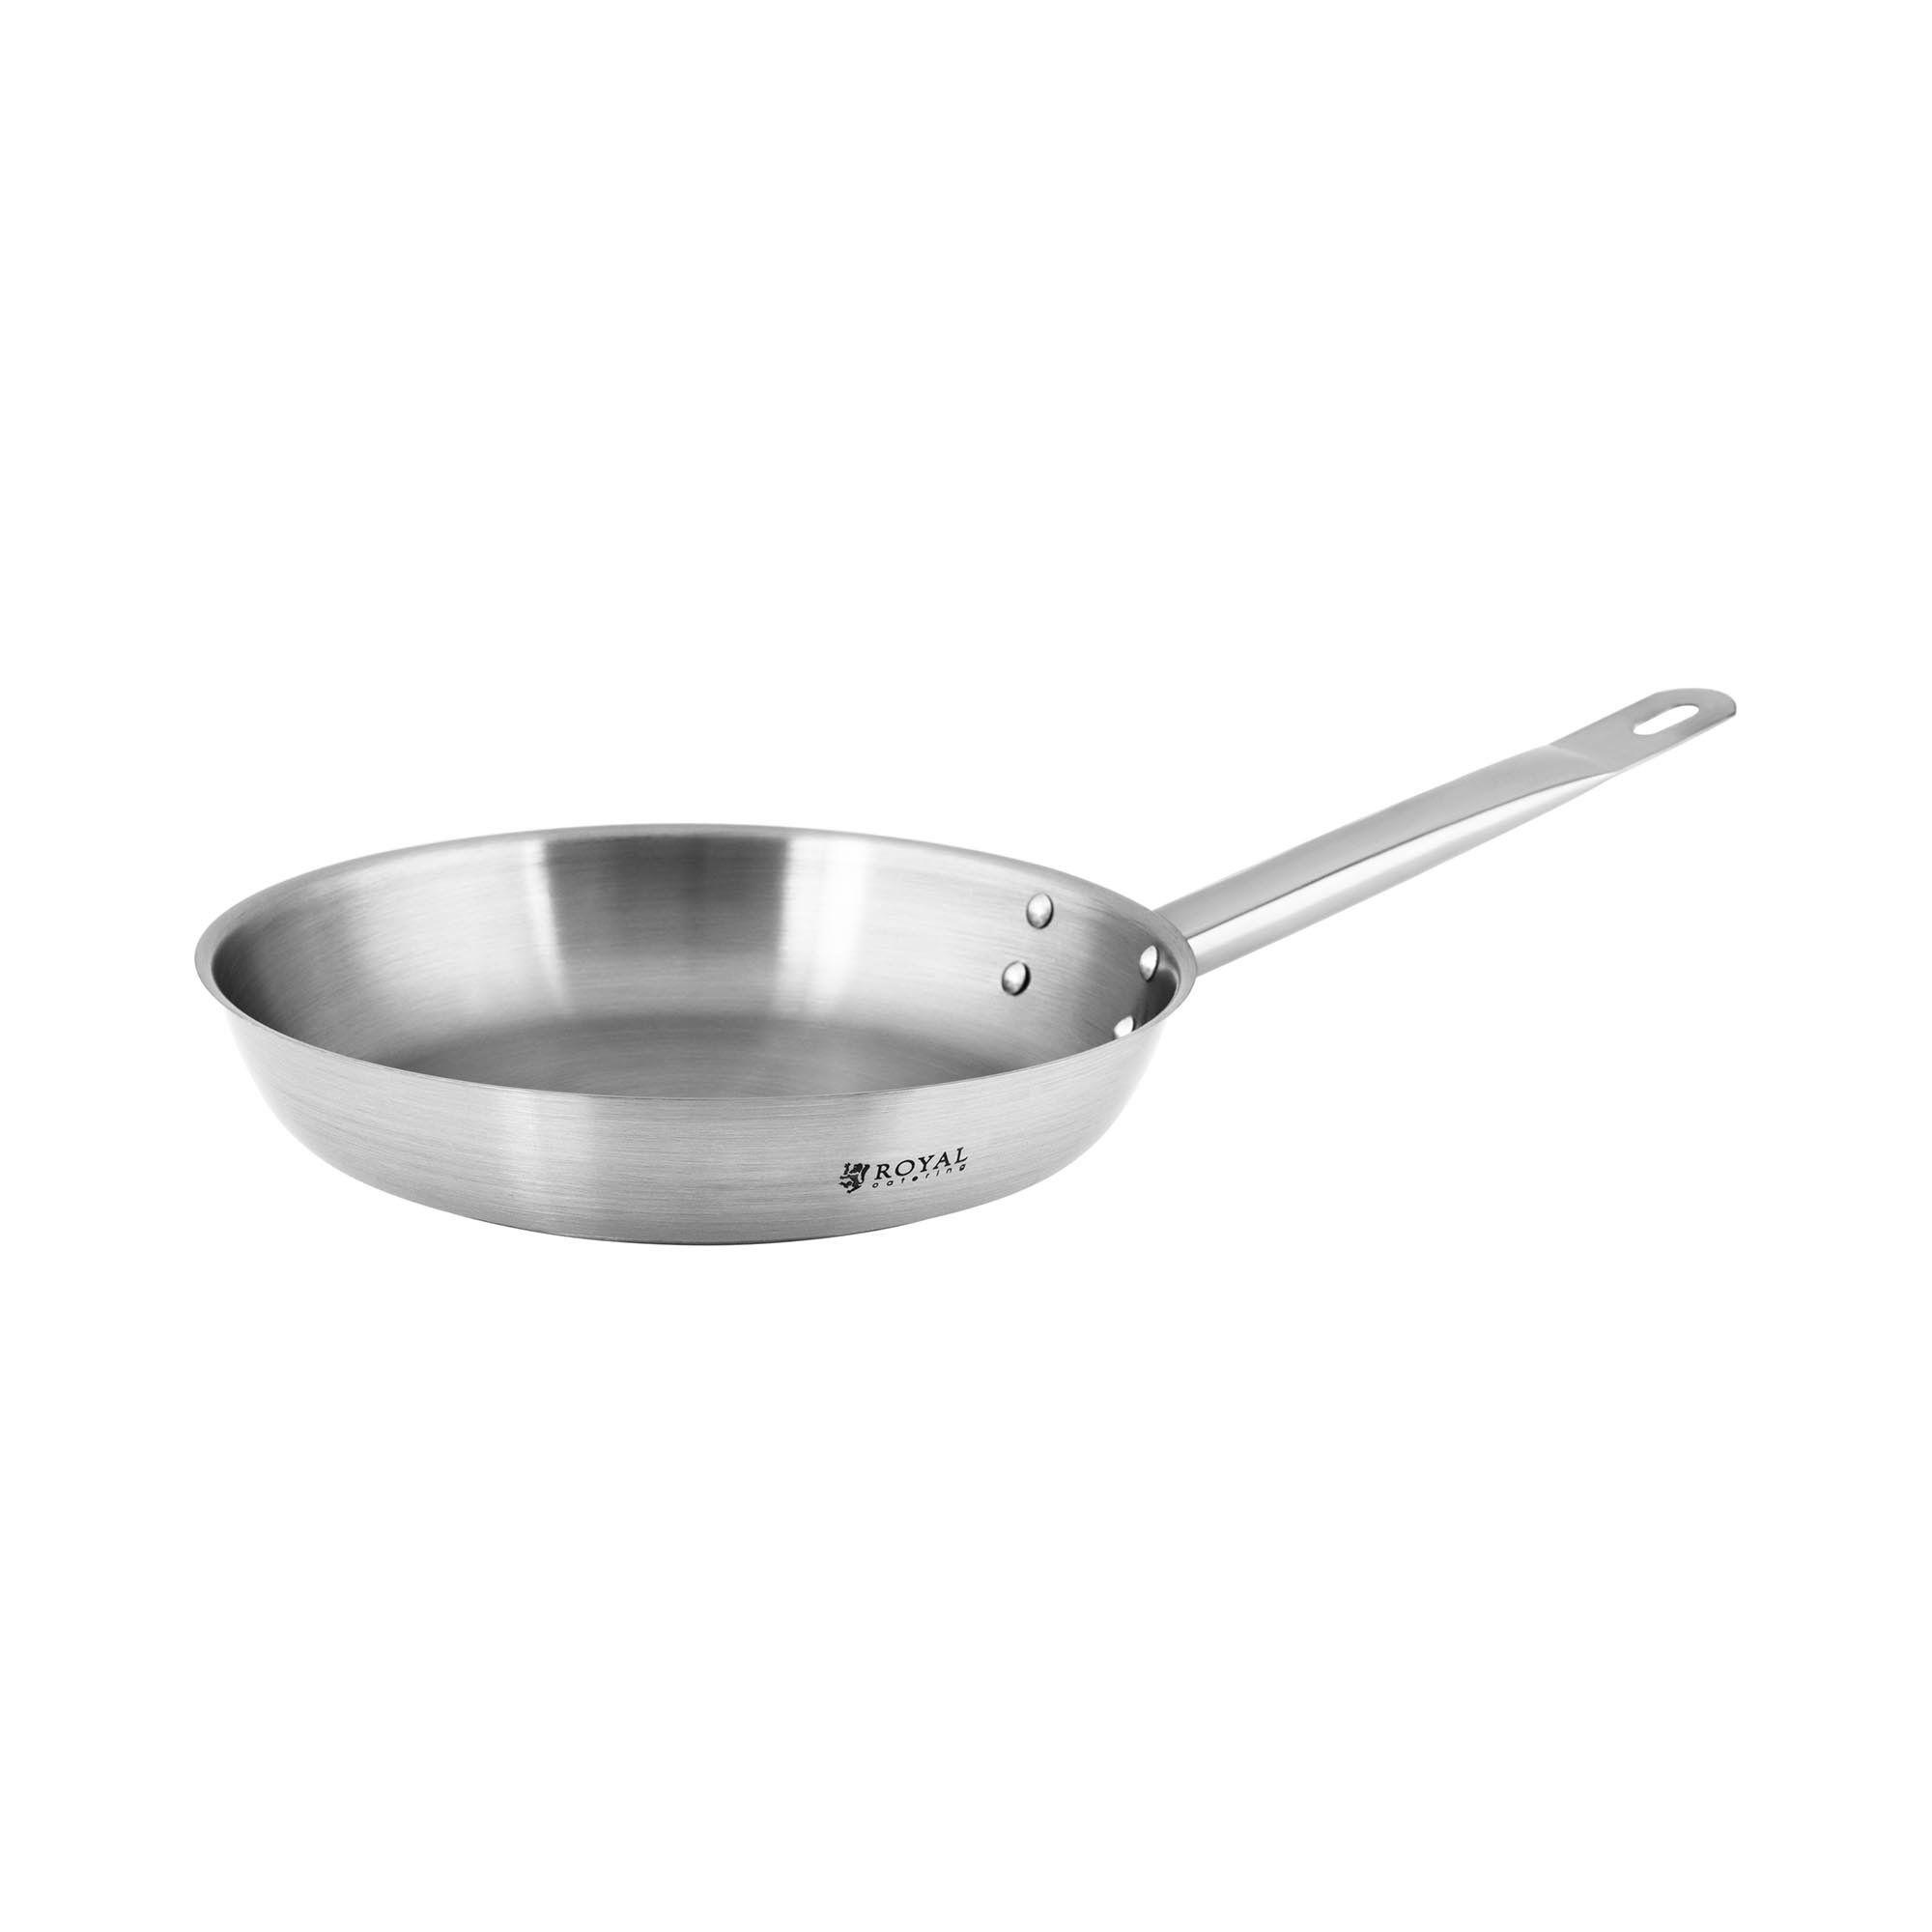 Royal Catering Stekepanne i rustfritt stål - Ø 24 cm 10011205